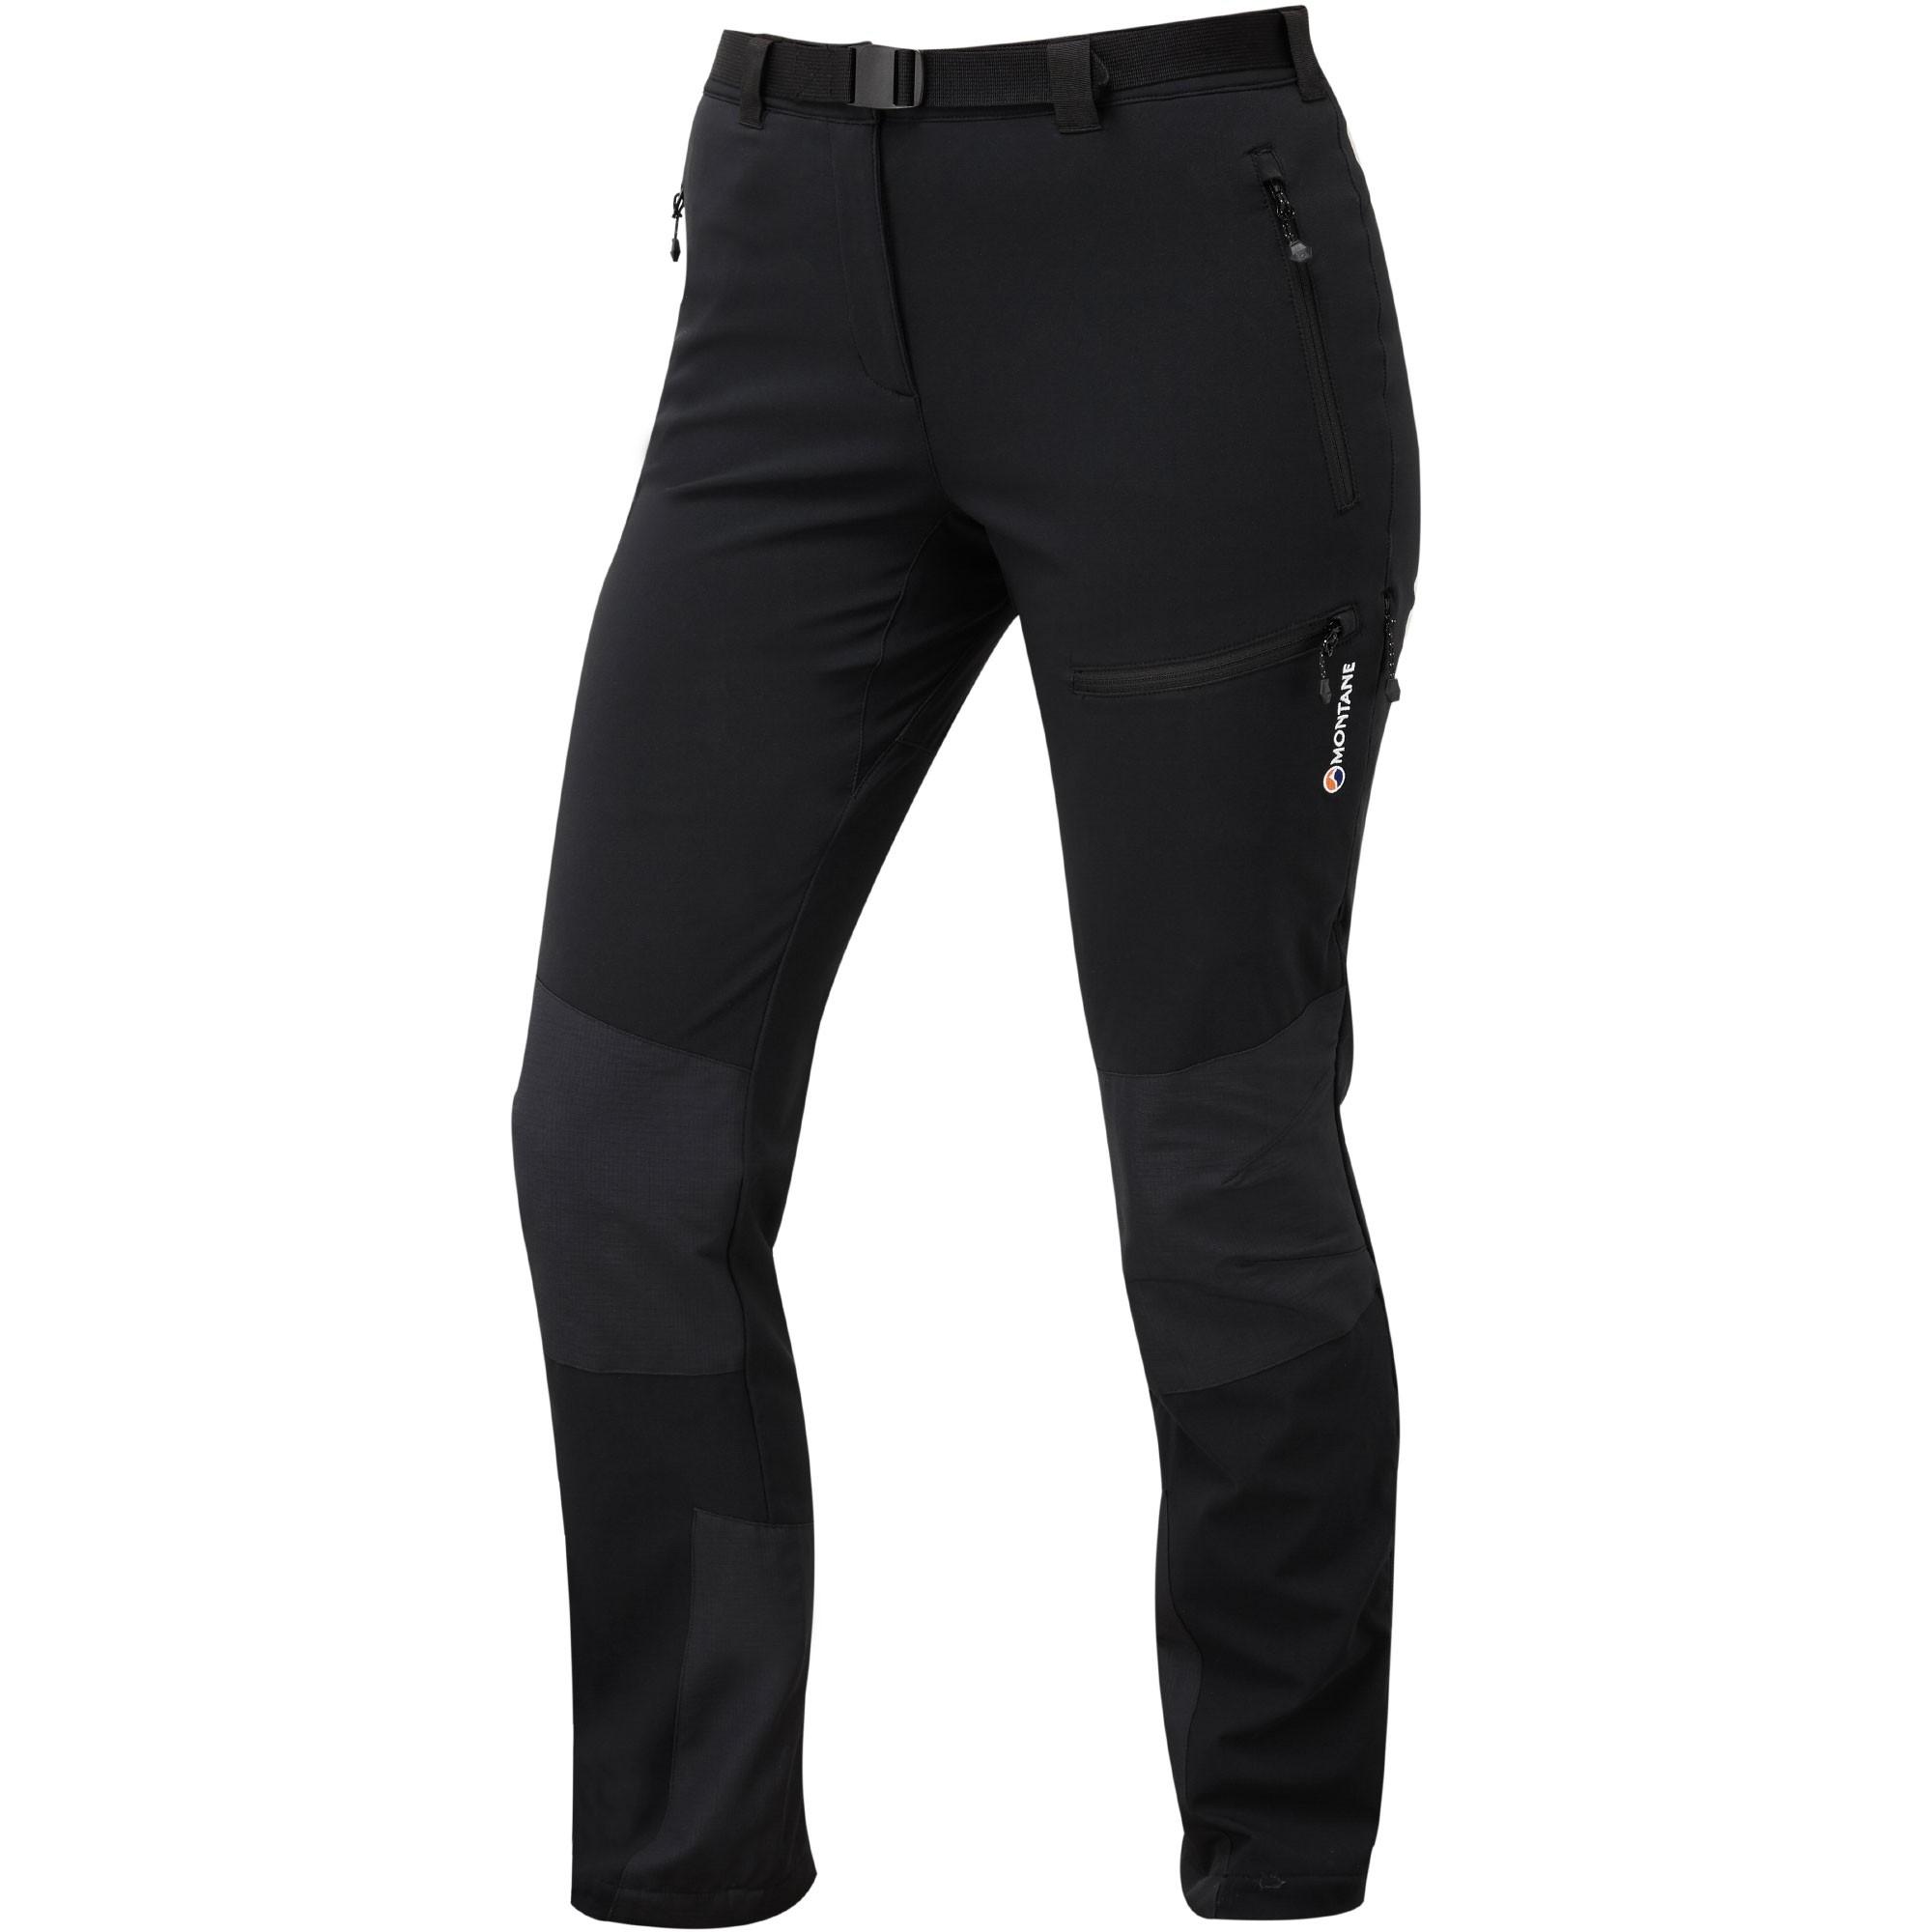 Montane Terra Mission Women's Mountaineering Pants - Black